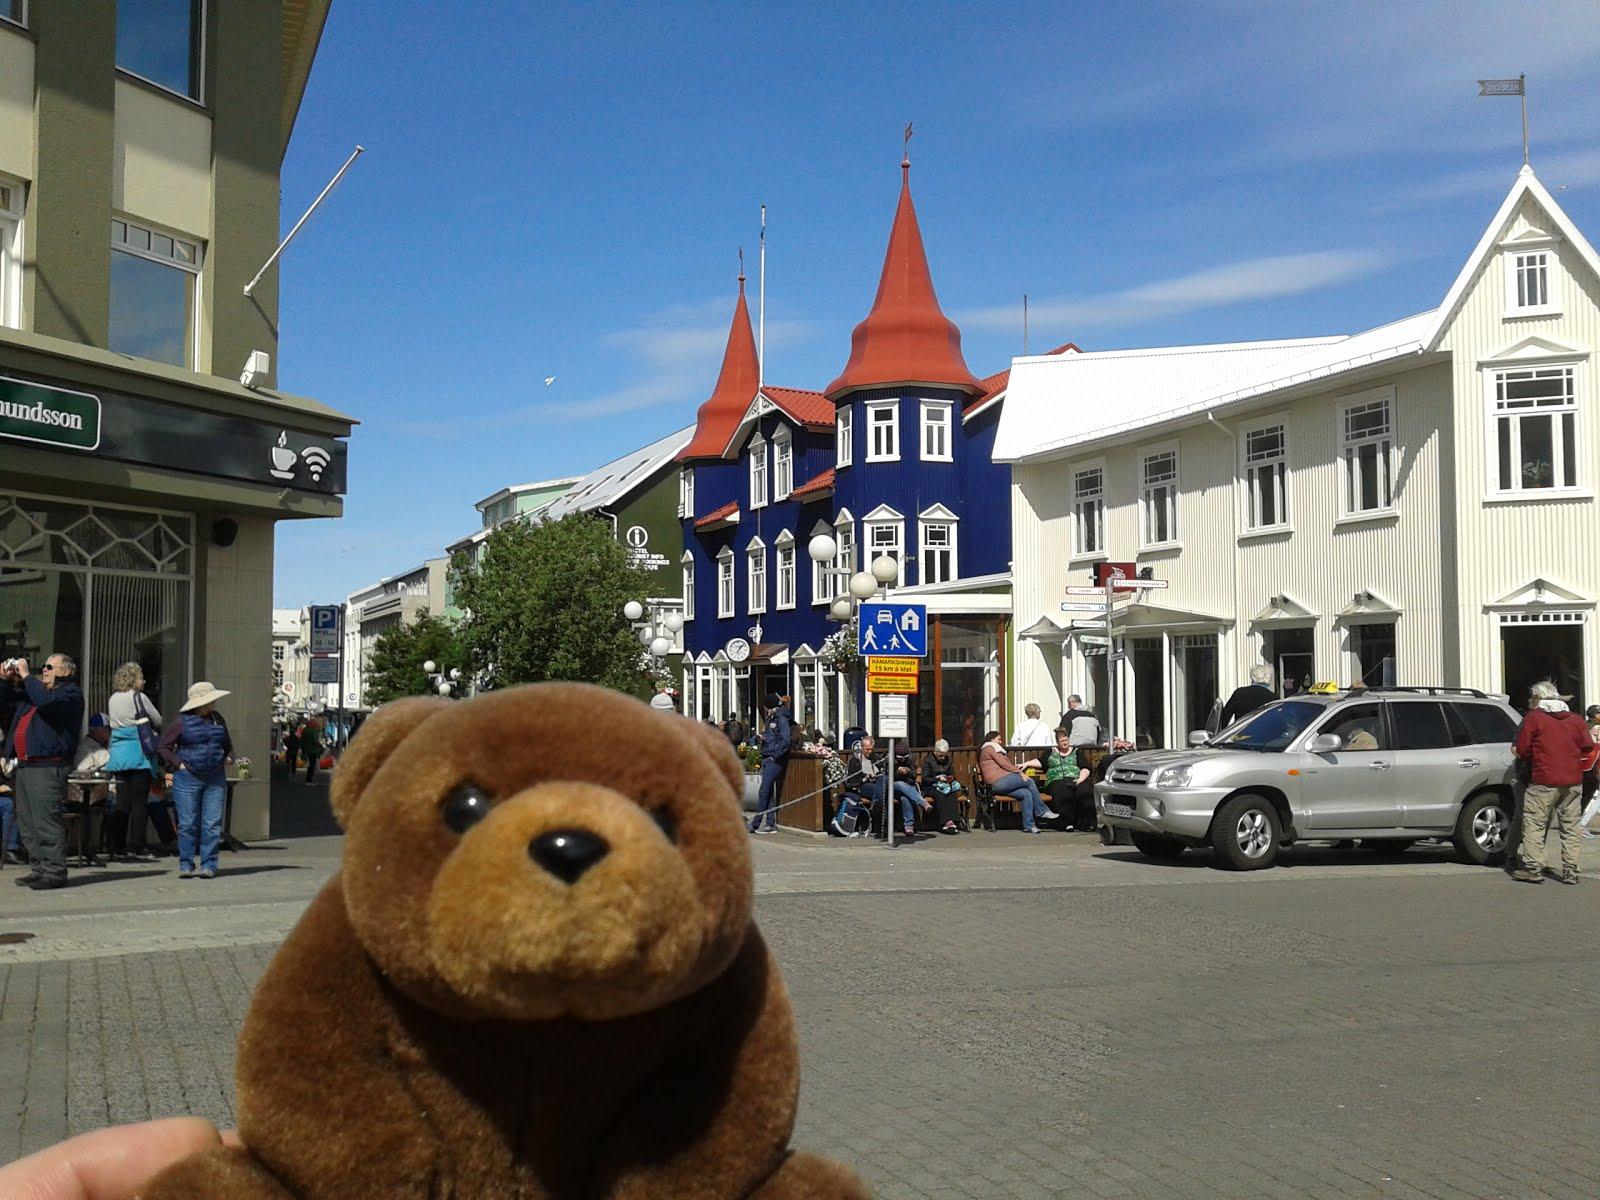 Teddy Bear in Akureyri, Iceland